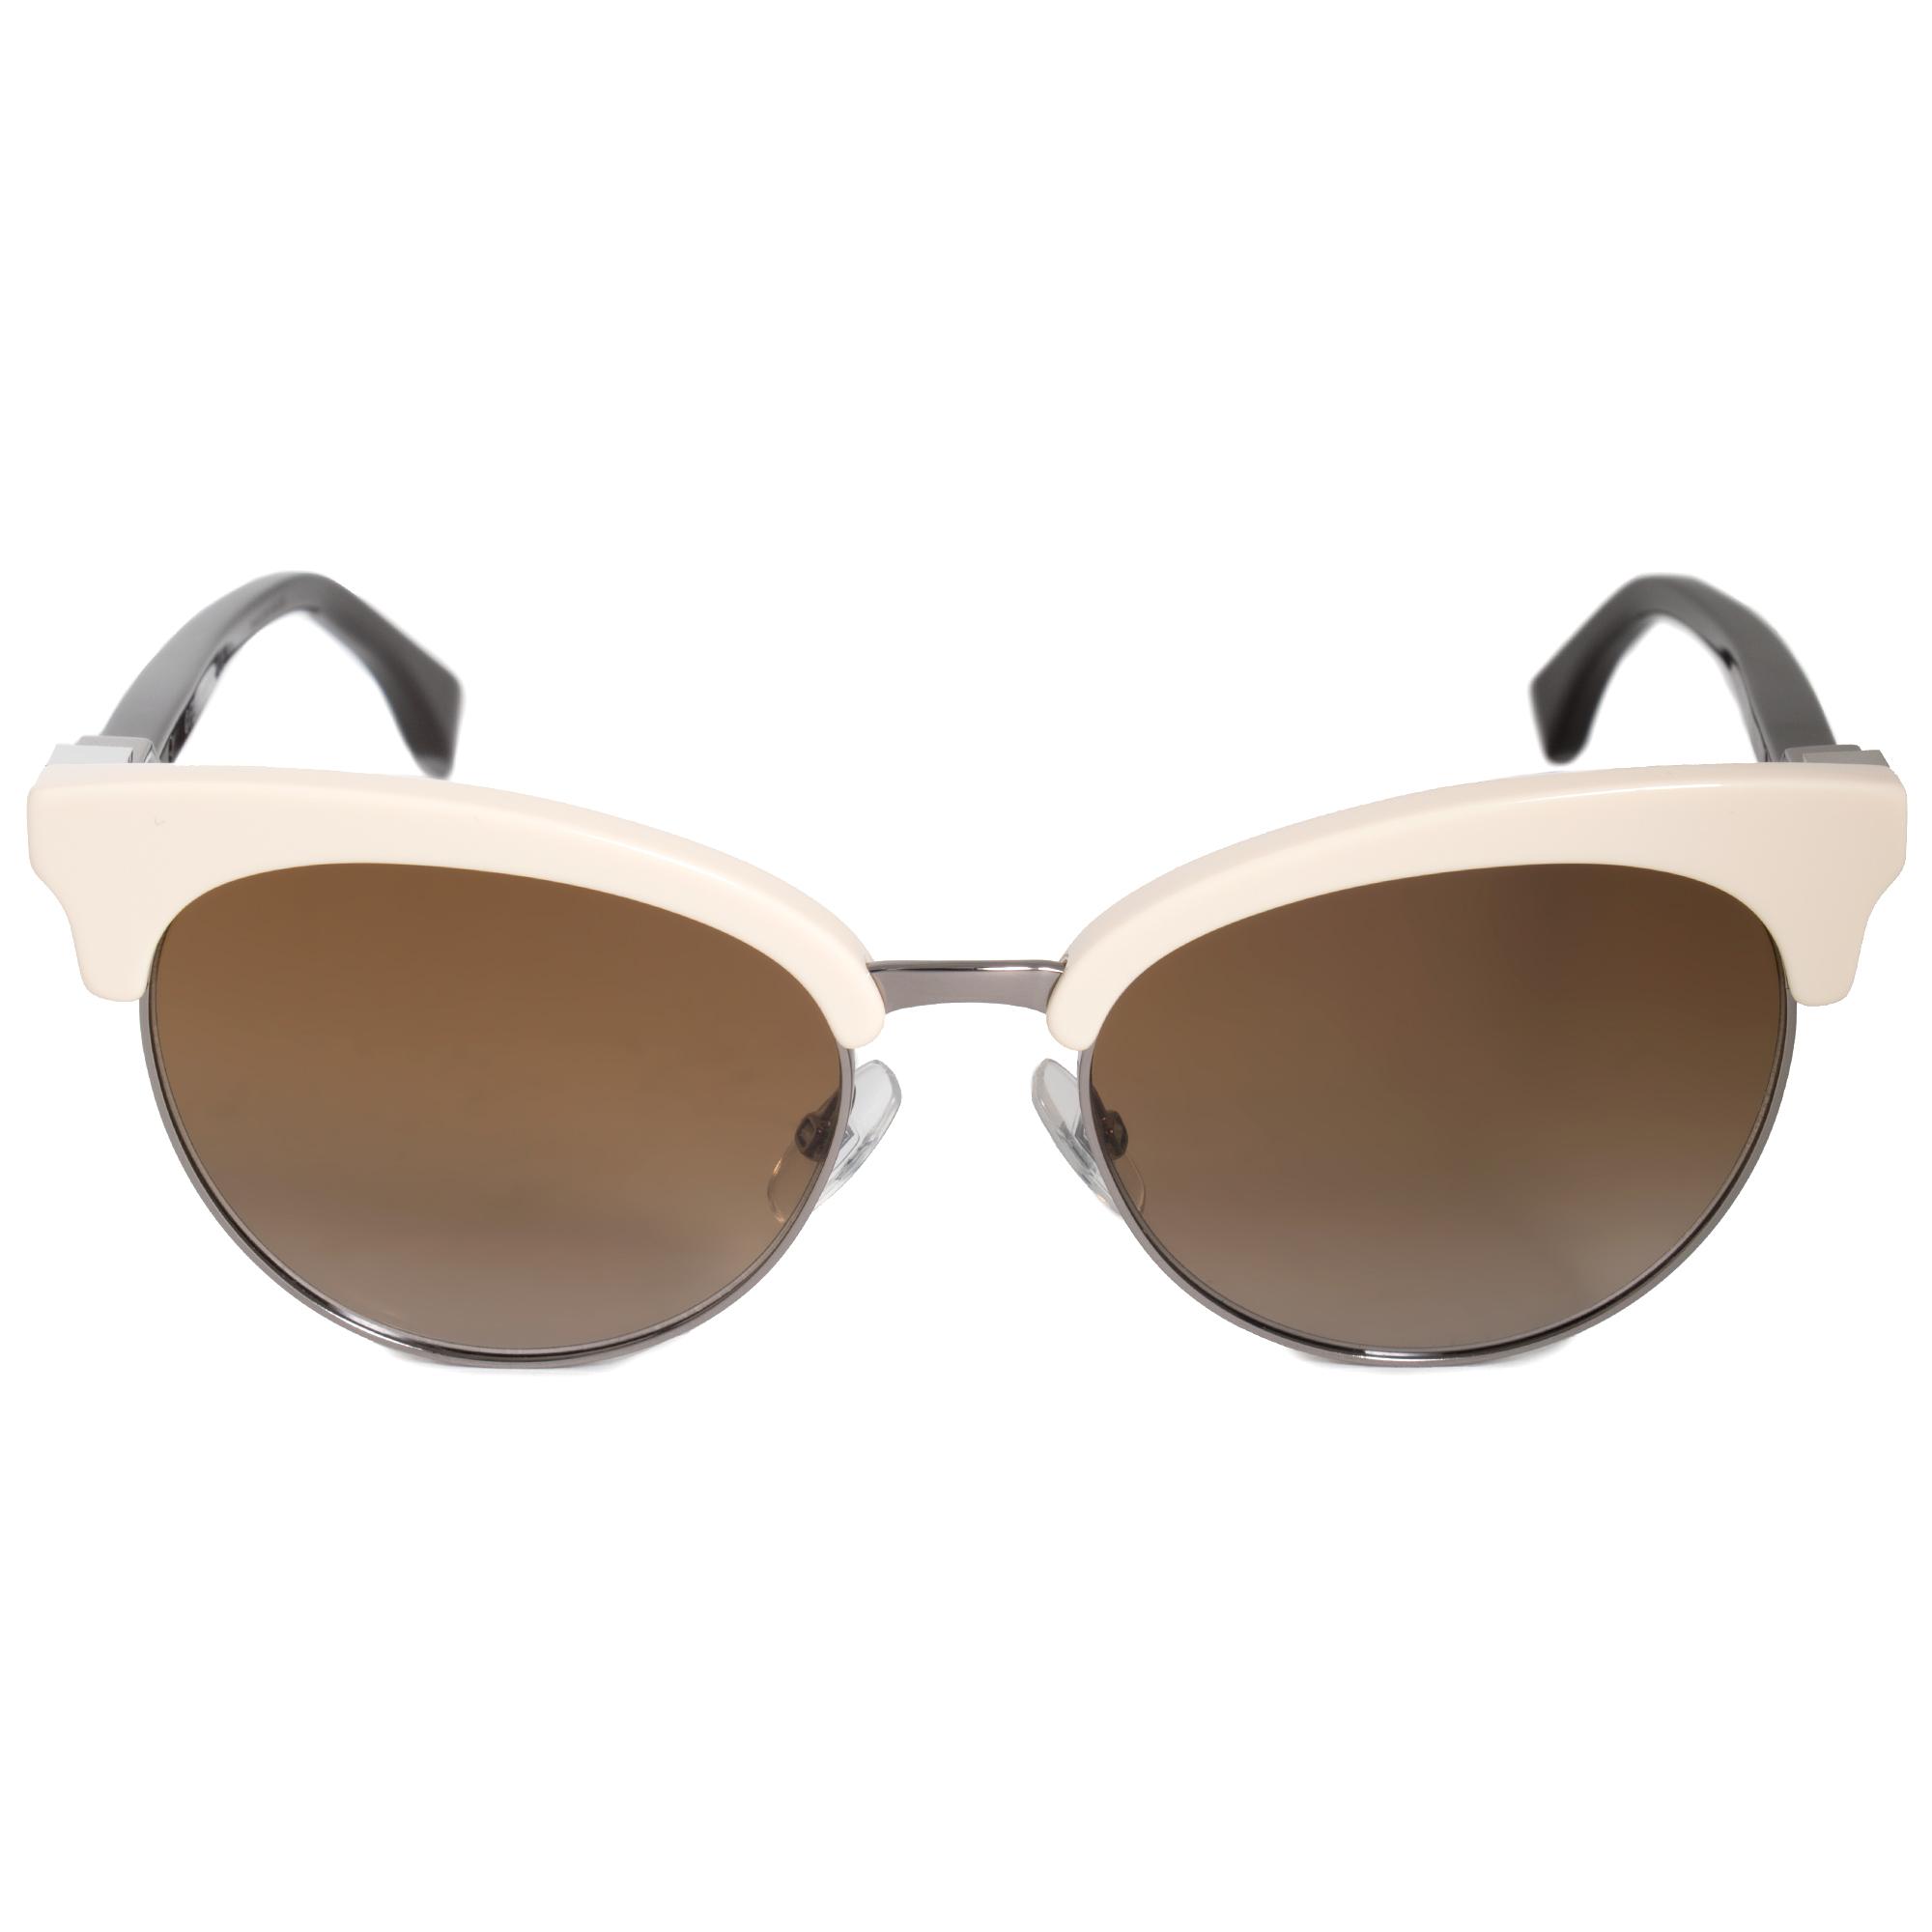 4a4de7647107 Fendi Cat Eye Sunglasses FF0229S VK6 81 56 762753611819 | eBay